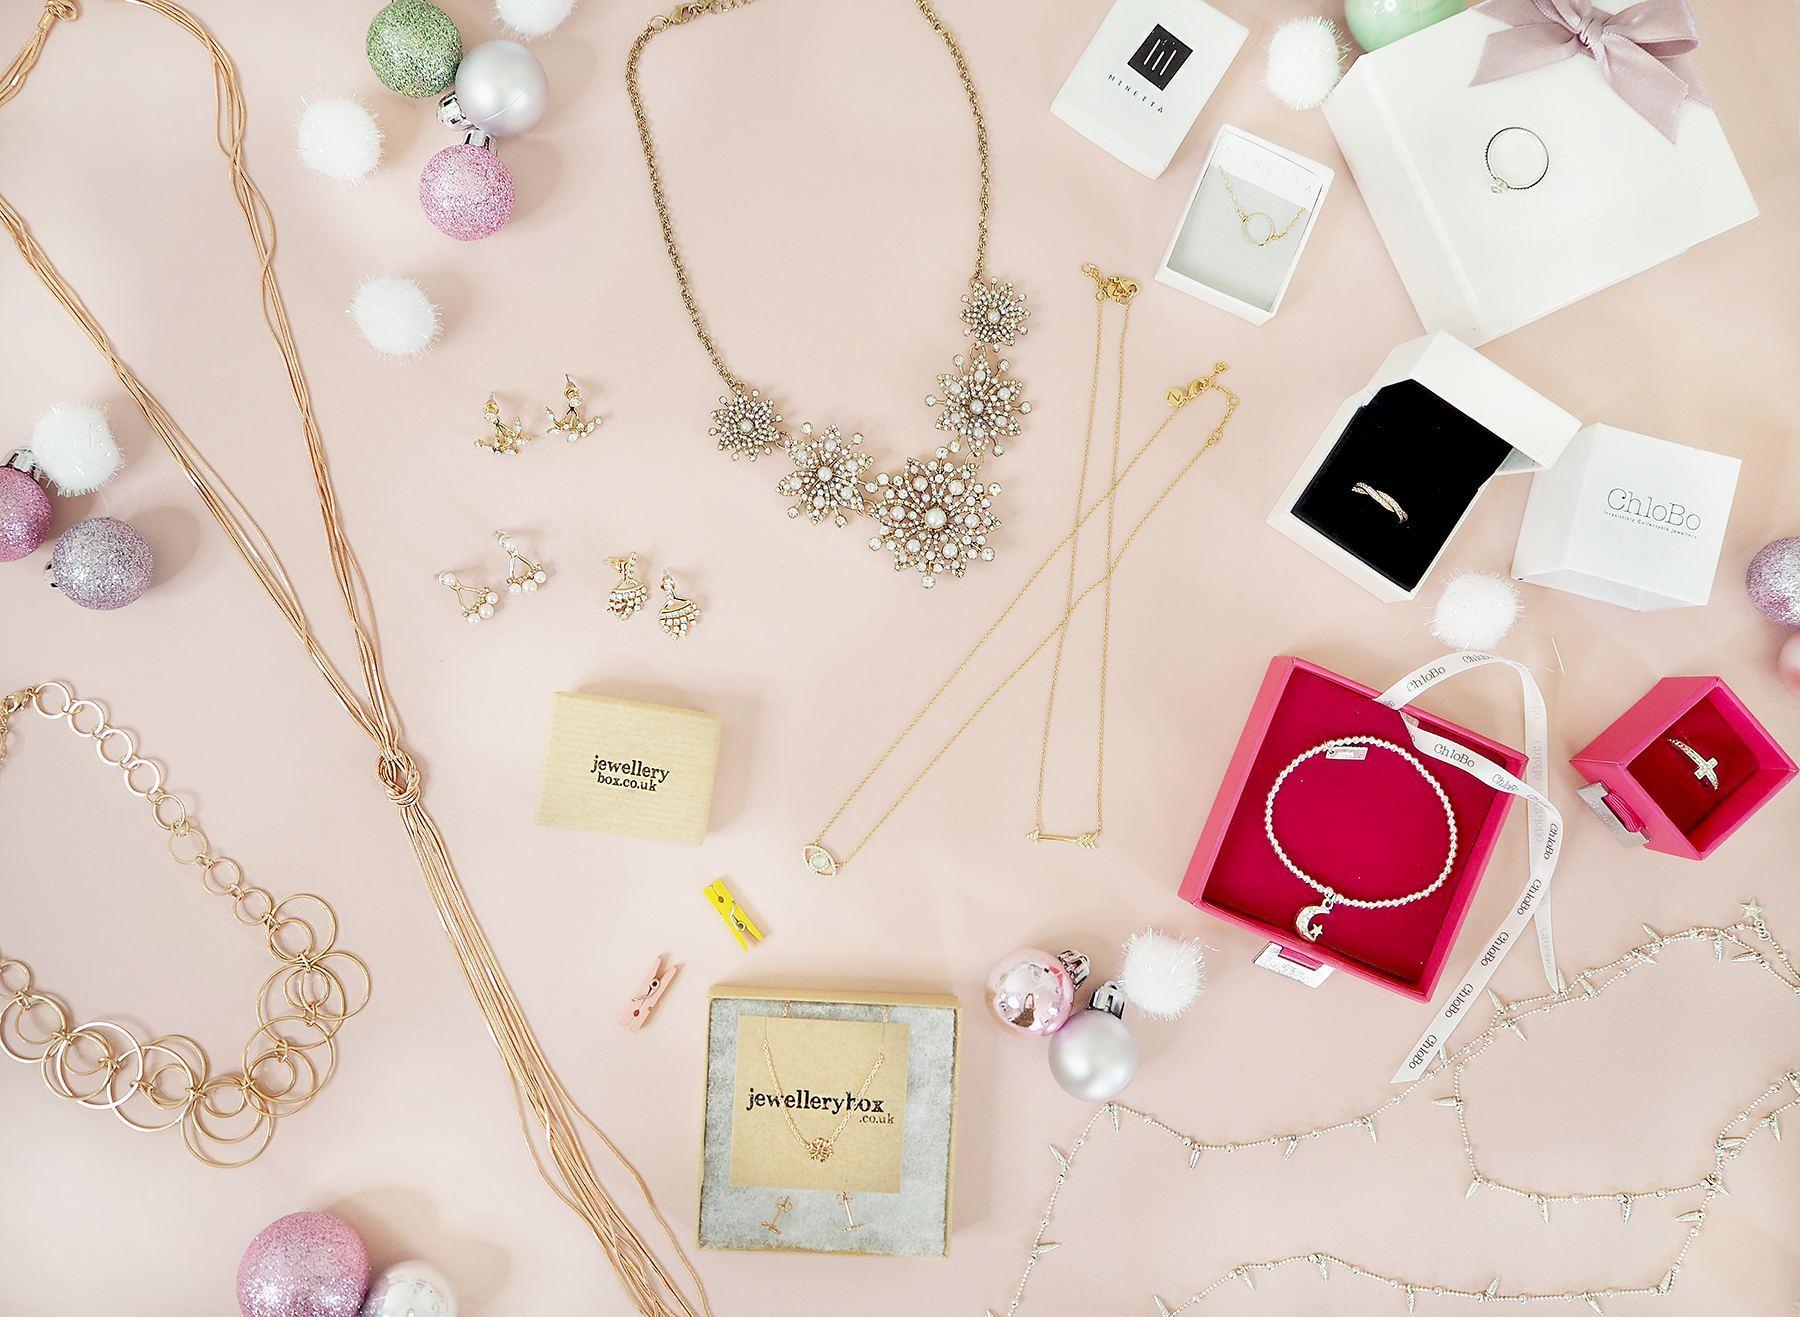 JEWELLERY christmas gifts